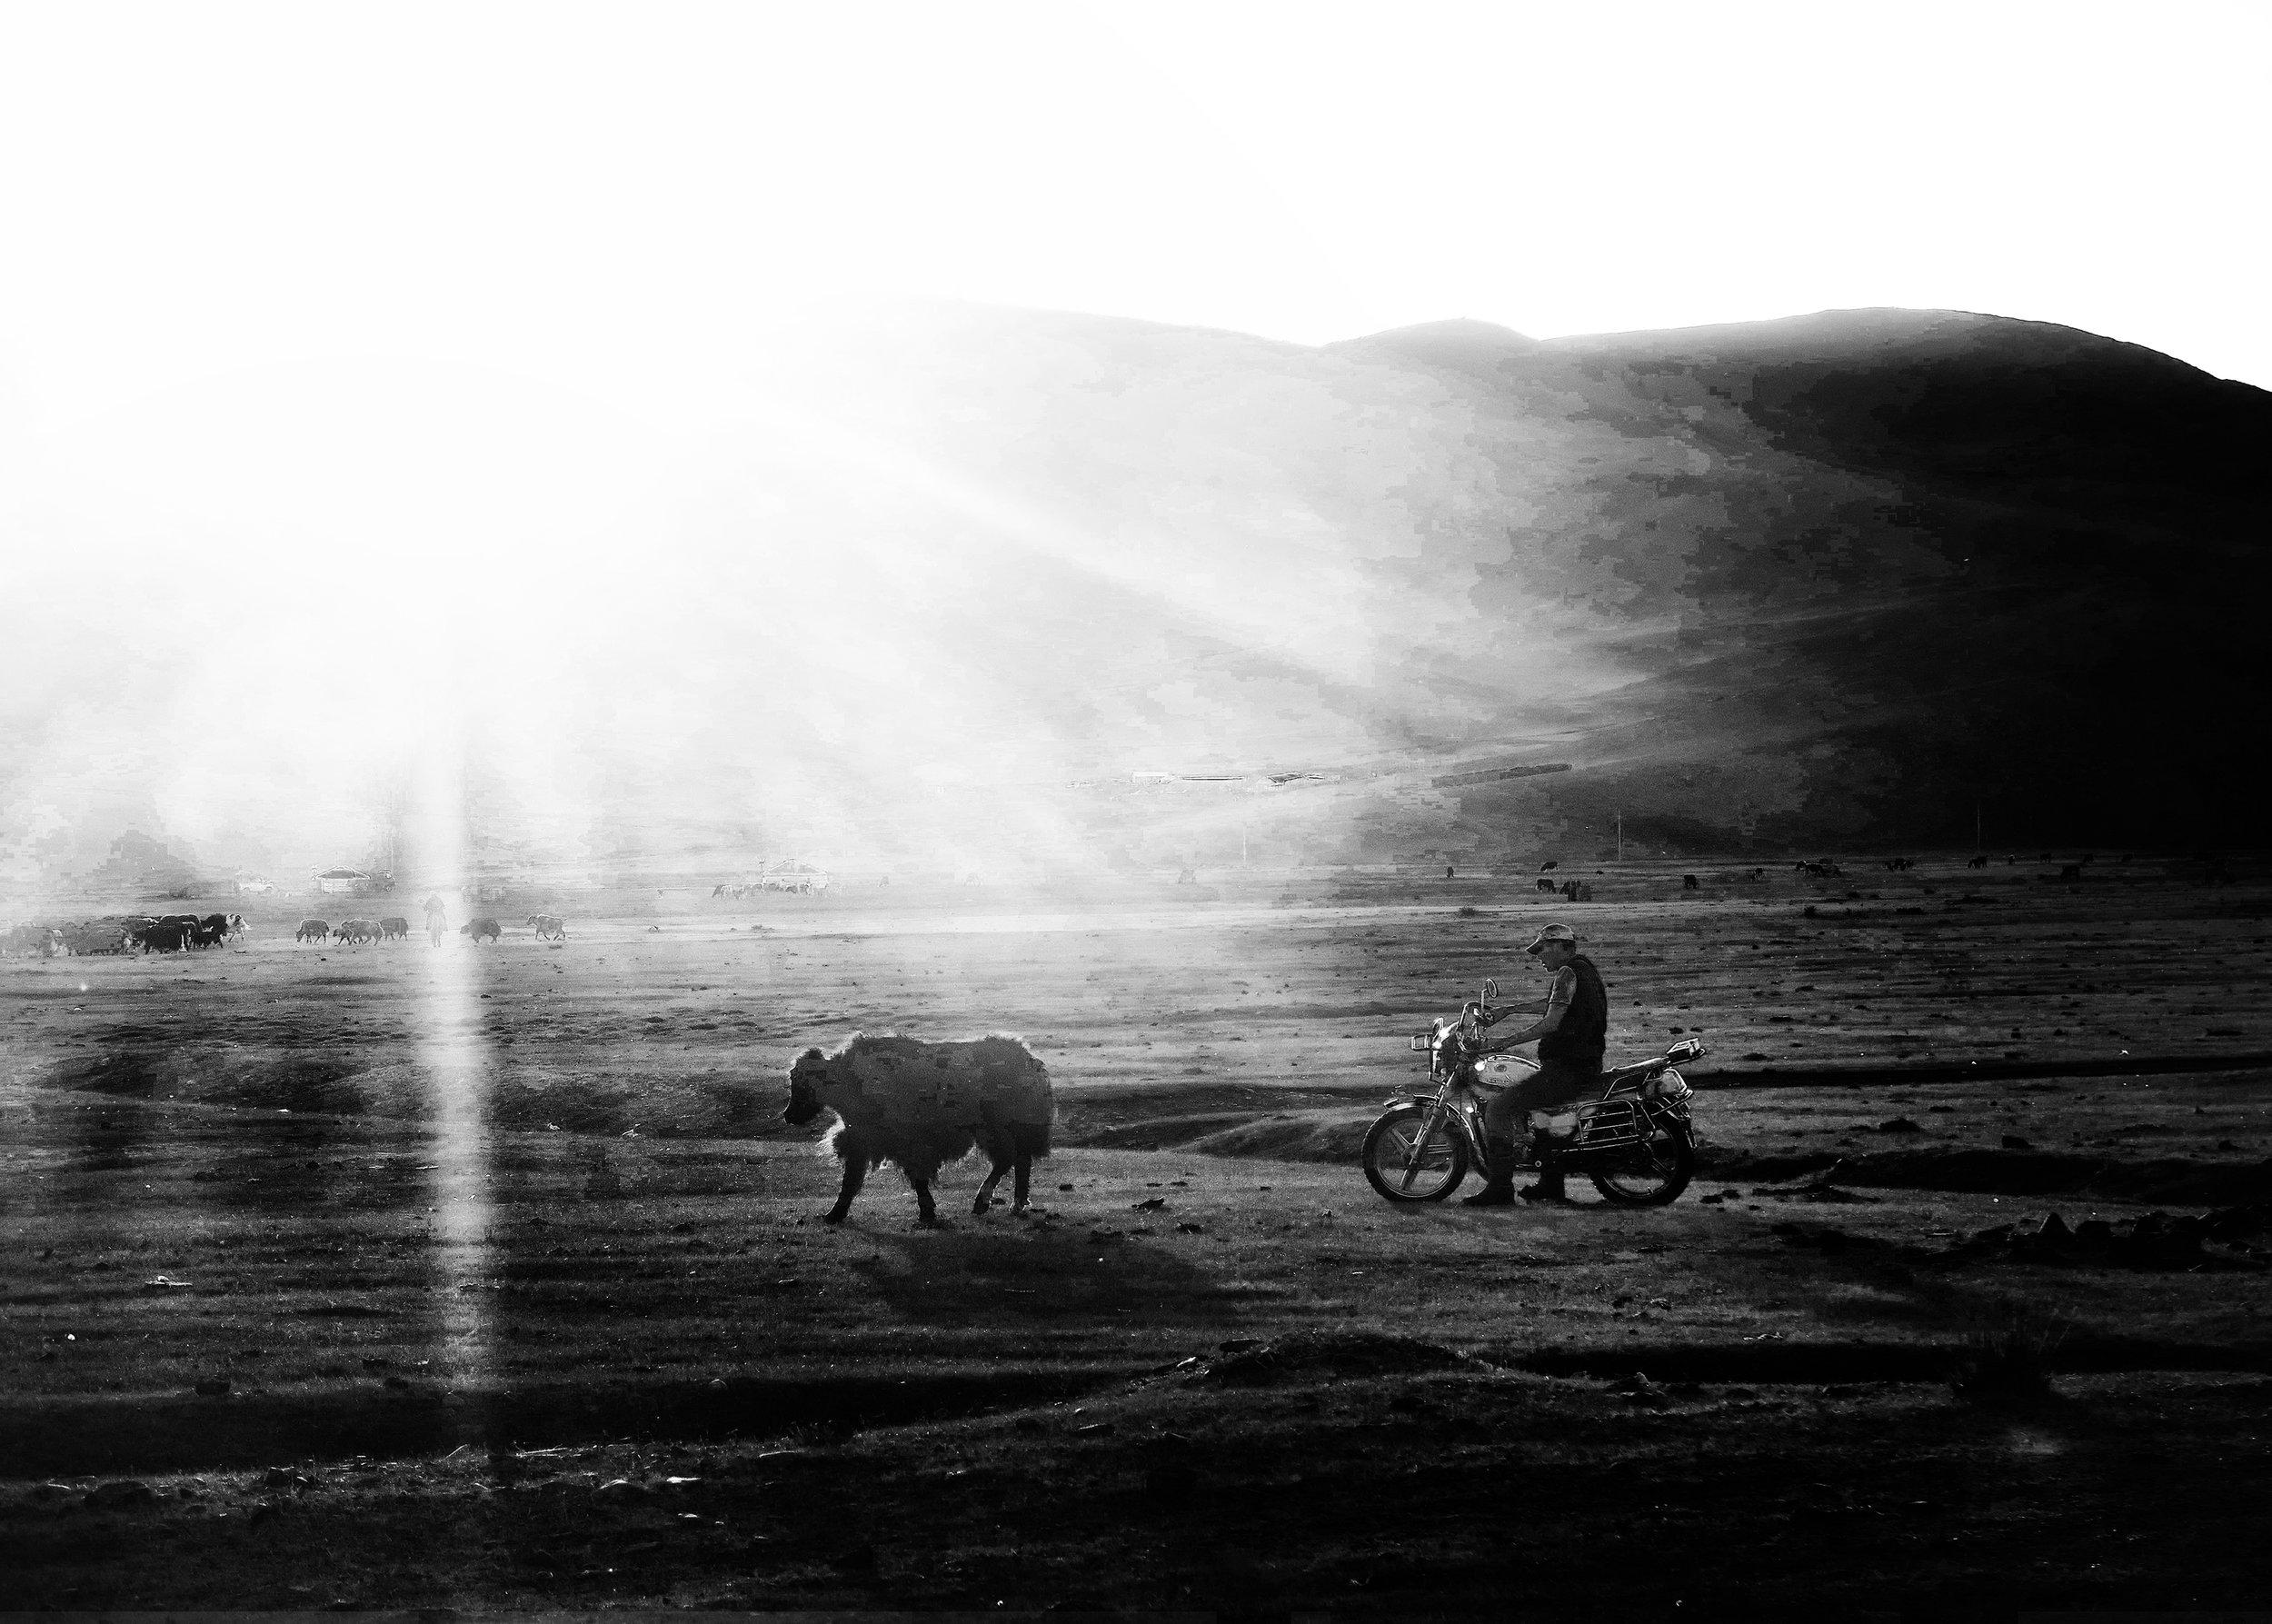 Copy of Mongolia 2017 by Janie Shih